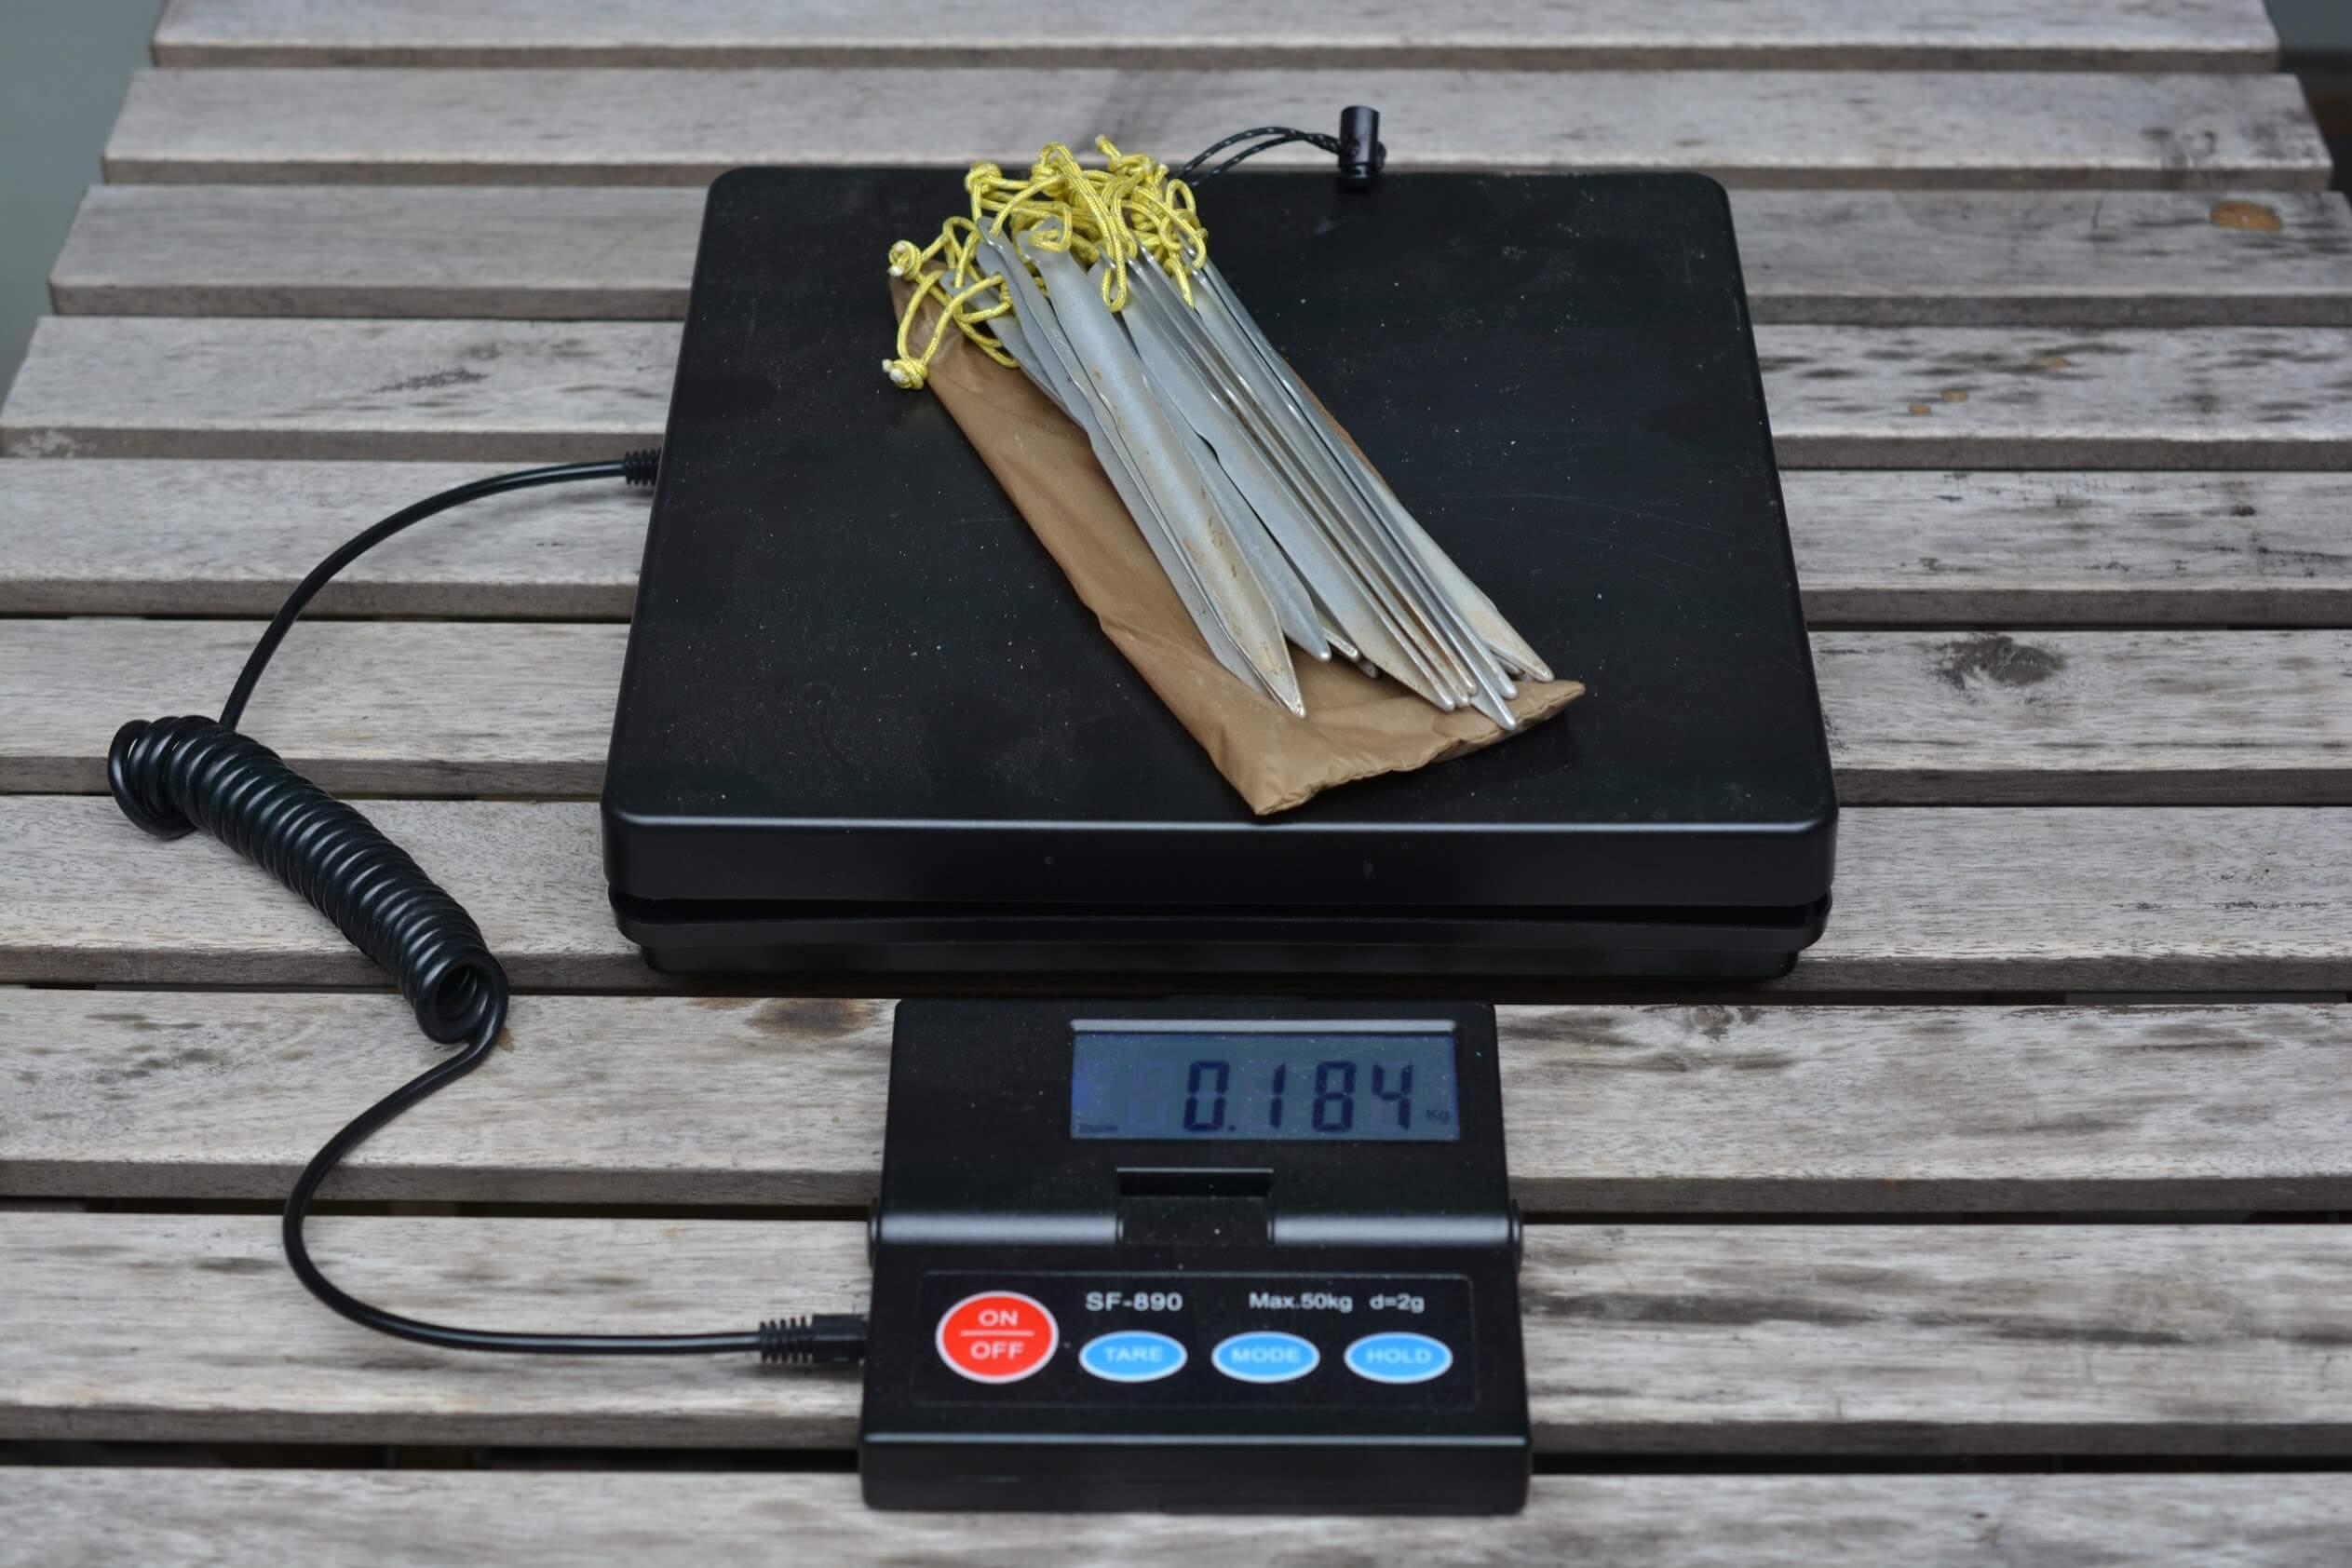 LocusGear Khufu HB / ローカスギア クフ HB DACペグ 重量